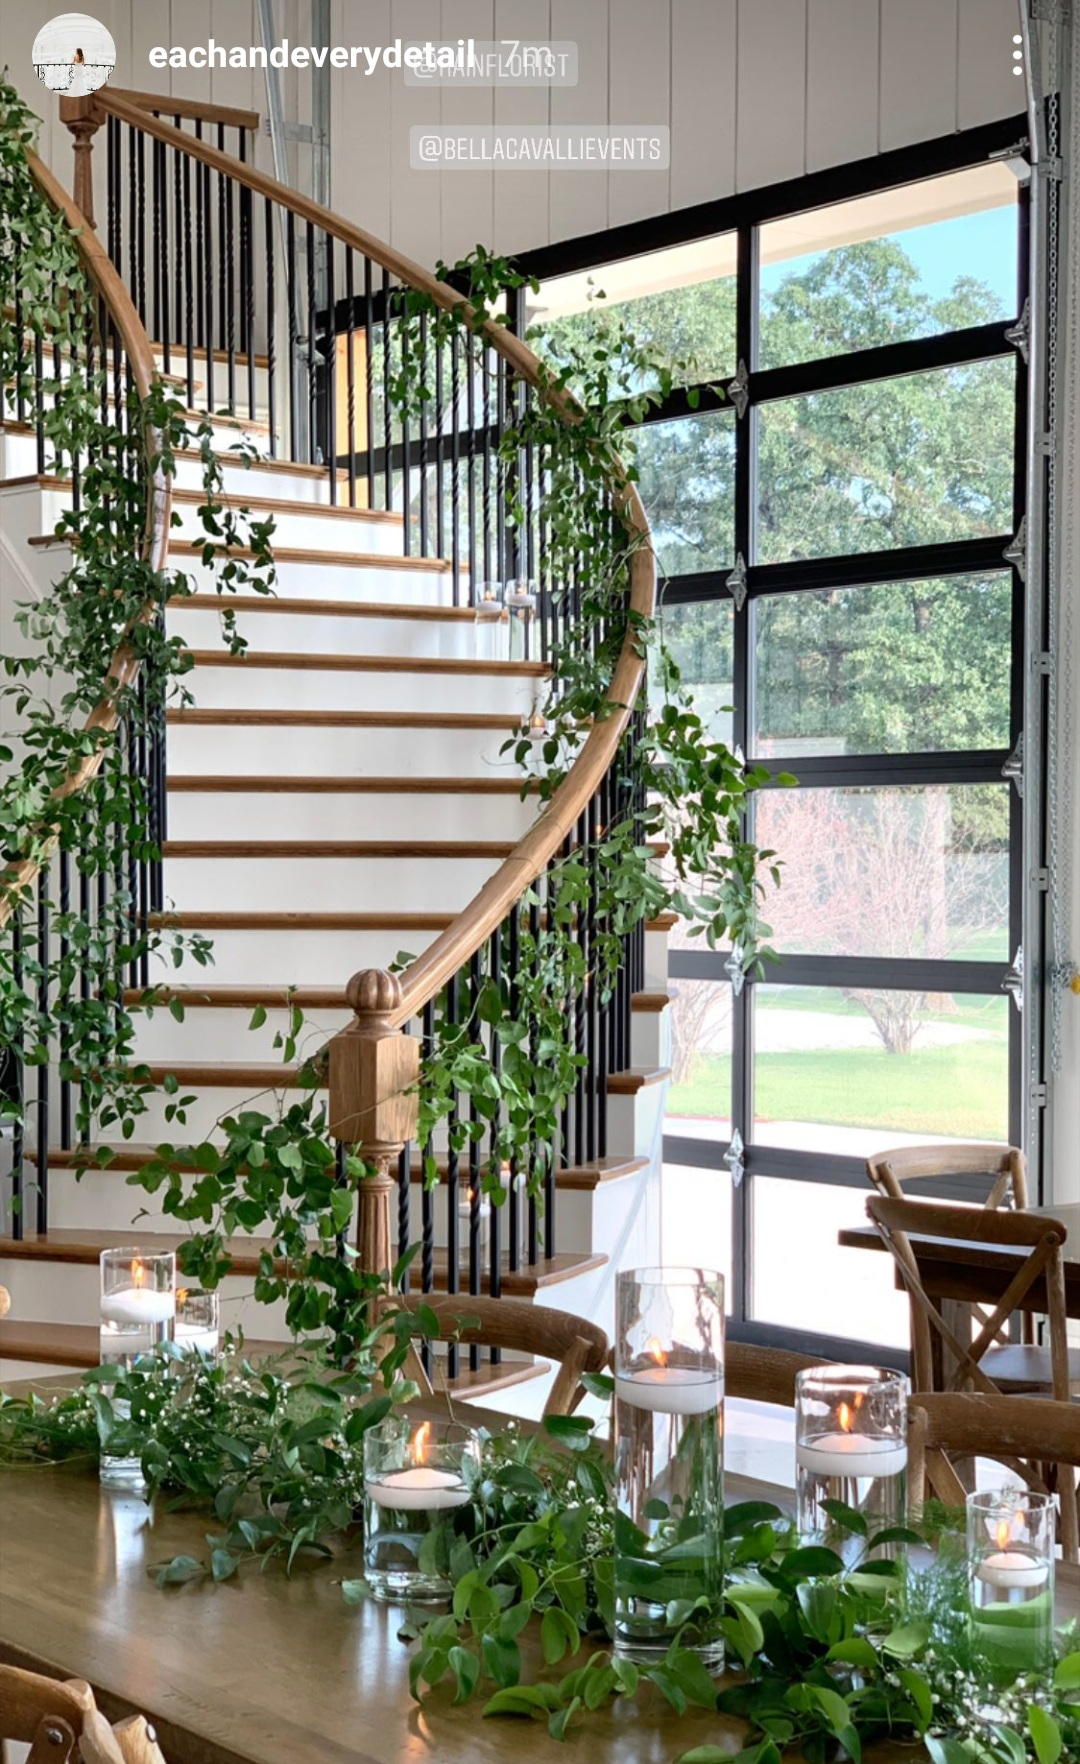 smilax staircase bella cavalli.jpg